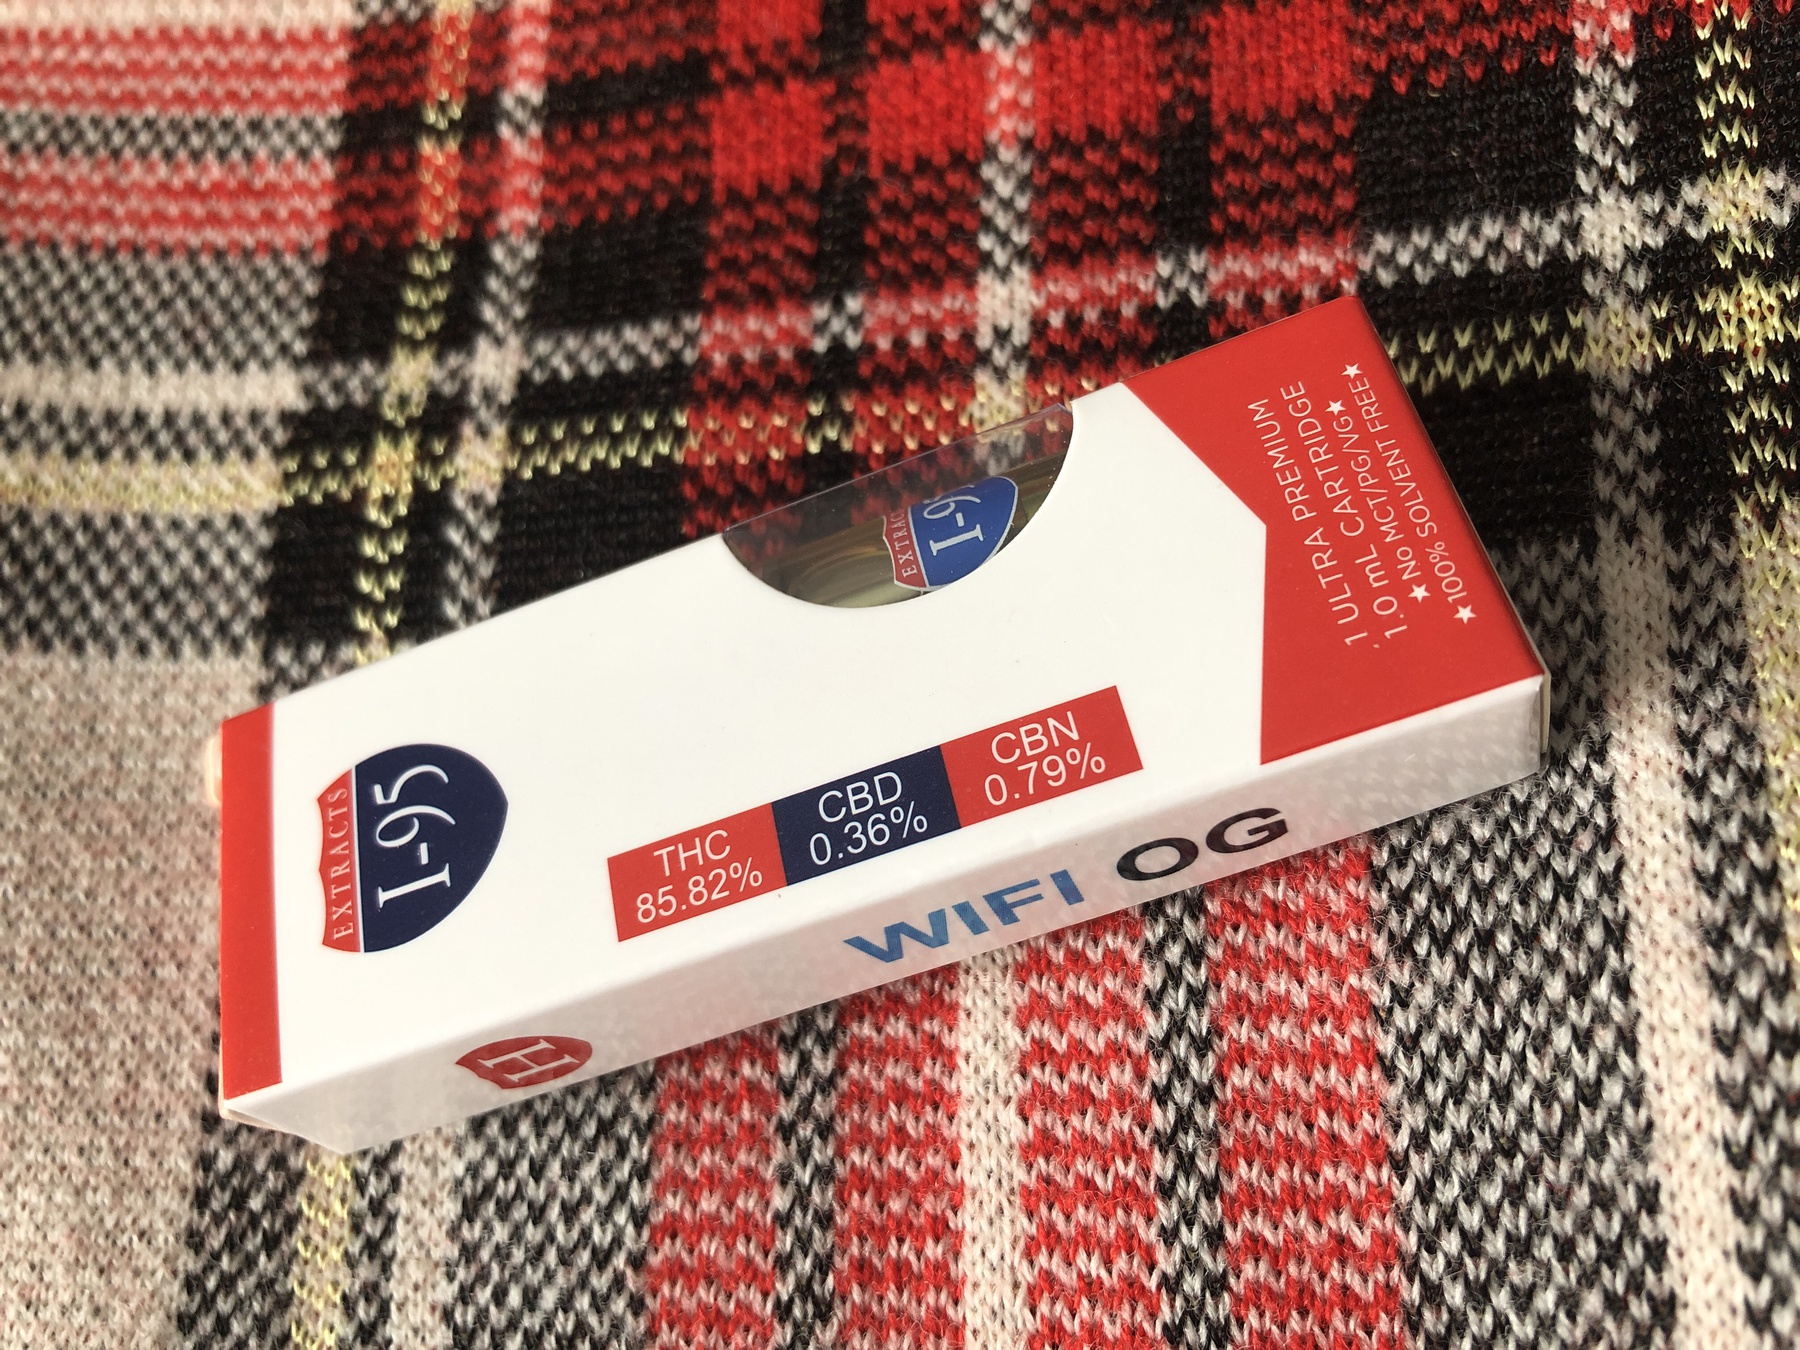 Wifi OG 1.0 Cartridge (I-95 Brand) Product image